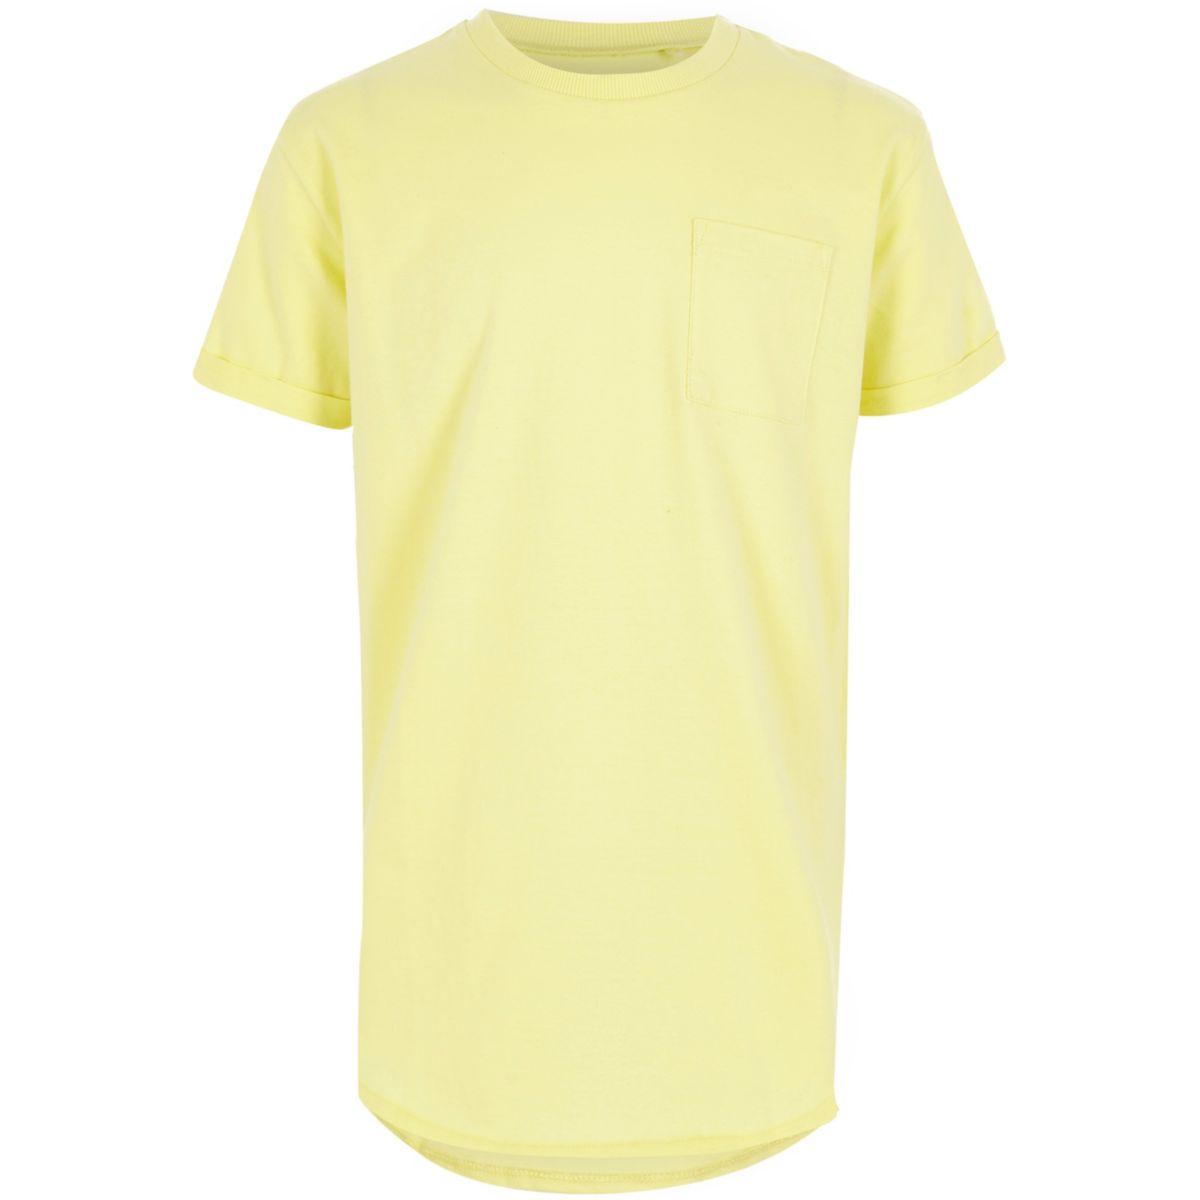 T-shirt jaune clair long pour garçon